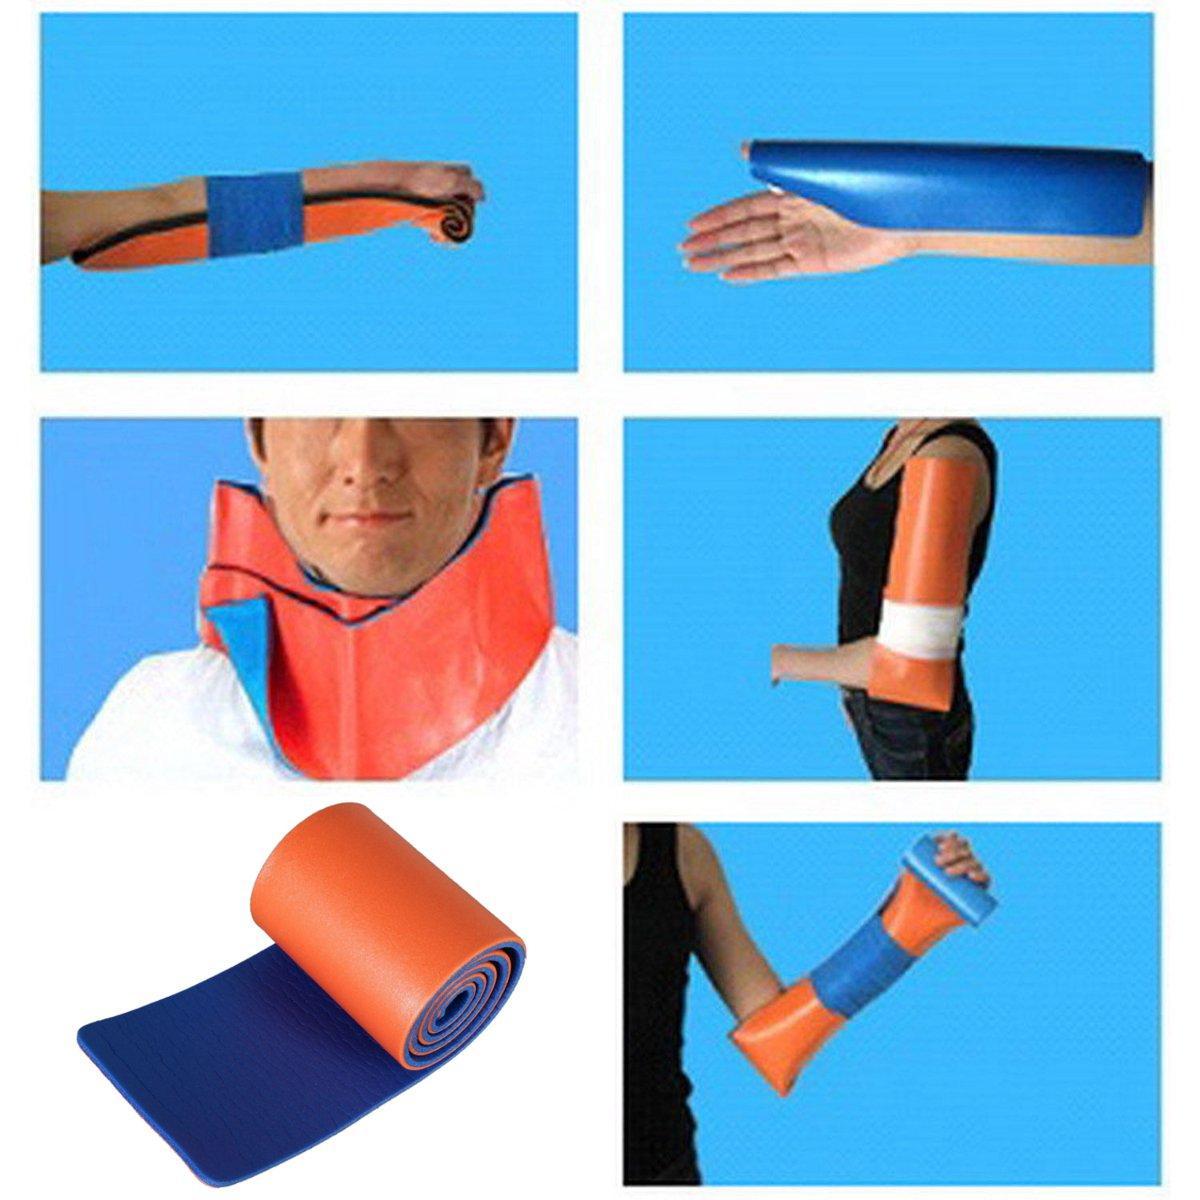 "36/"" Shank Bone Splint not Sam Splint Leg Arm Wrist fixed Fracture Wound Protect"